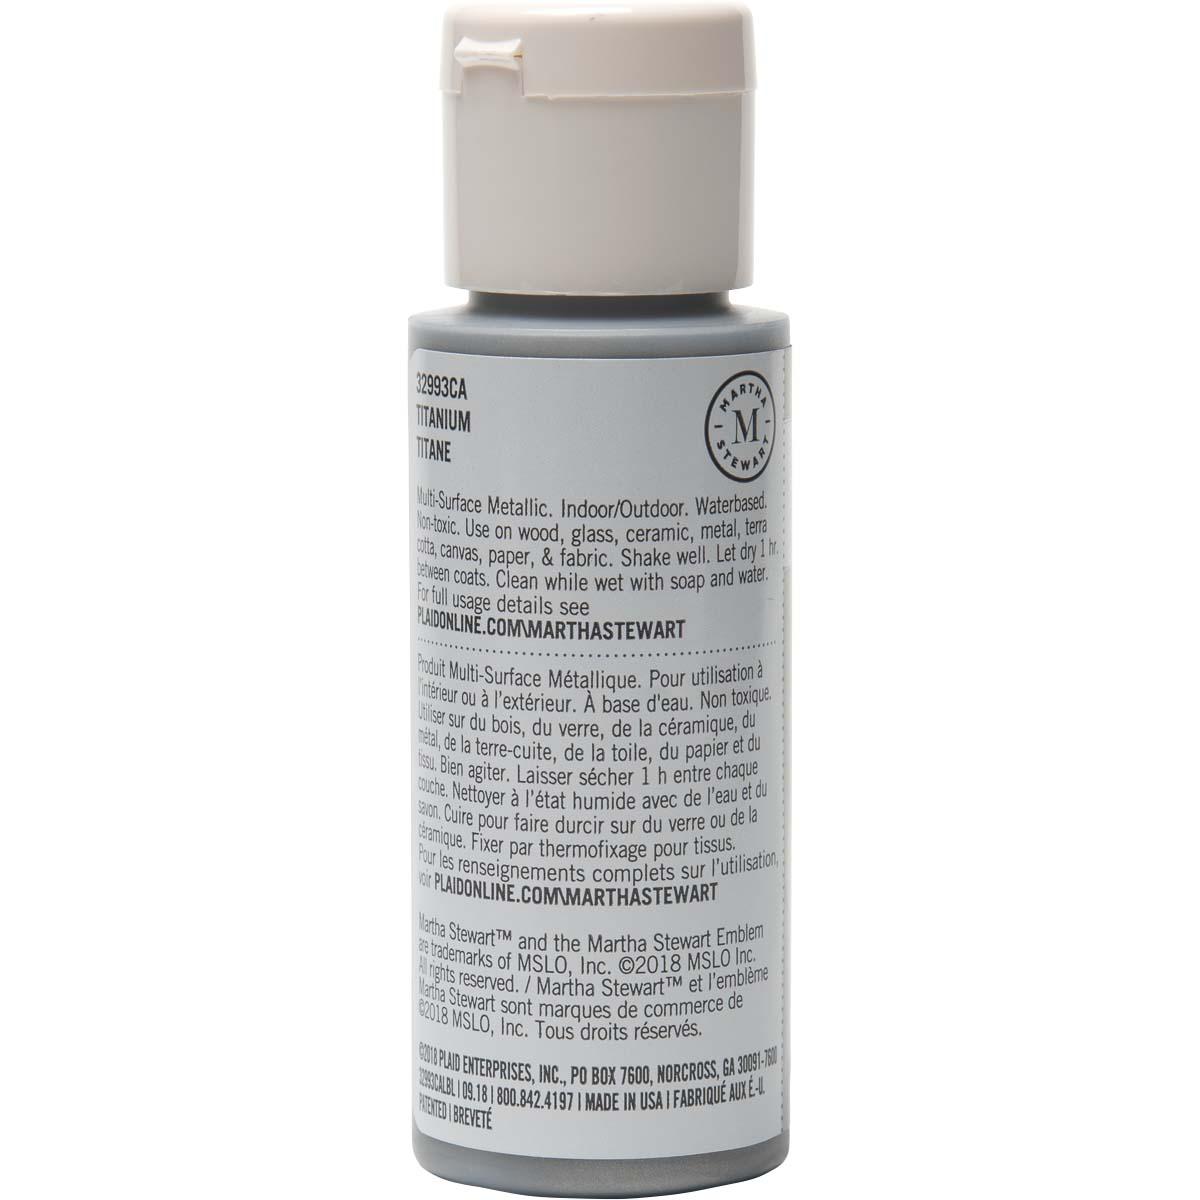 Martha Stewart ® Multi-Surface Metallic Acrylic Craft Paint - Titanium, 2 oz. - 32993CA